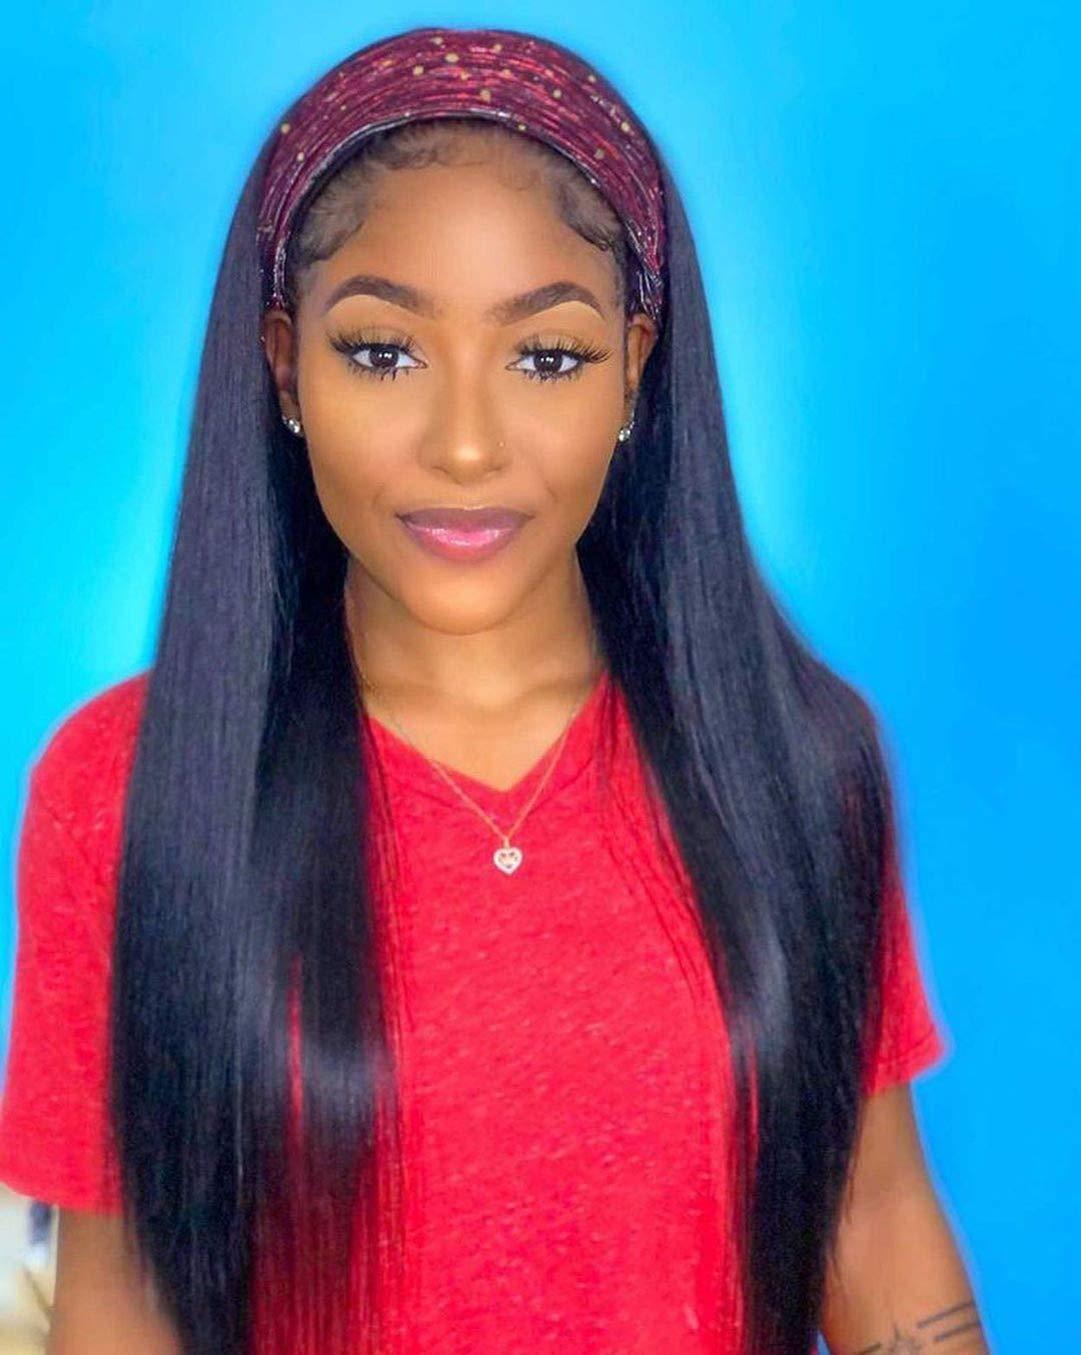 Straight Human Hair Headband 送料無料激安祭 正規取扱店 Wigs for Made Women N Machine Black